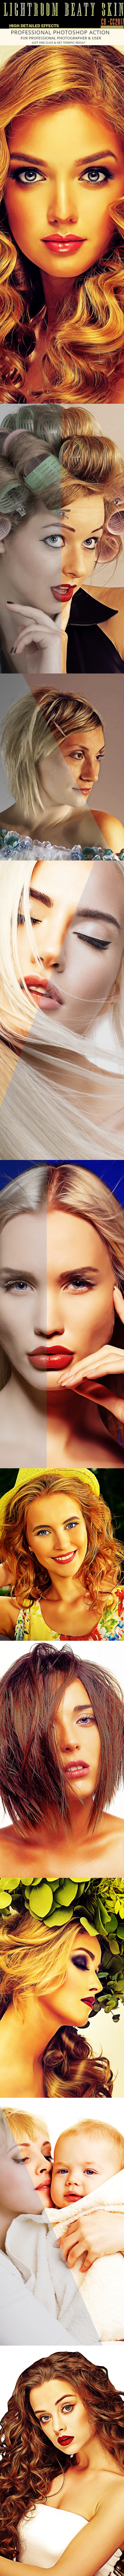 GraphicRiver Lightroom Beauty Skin 20692107